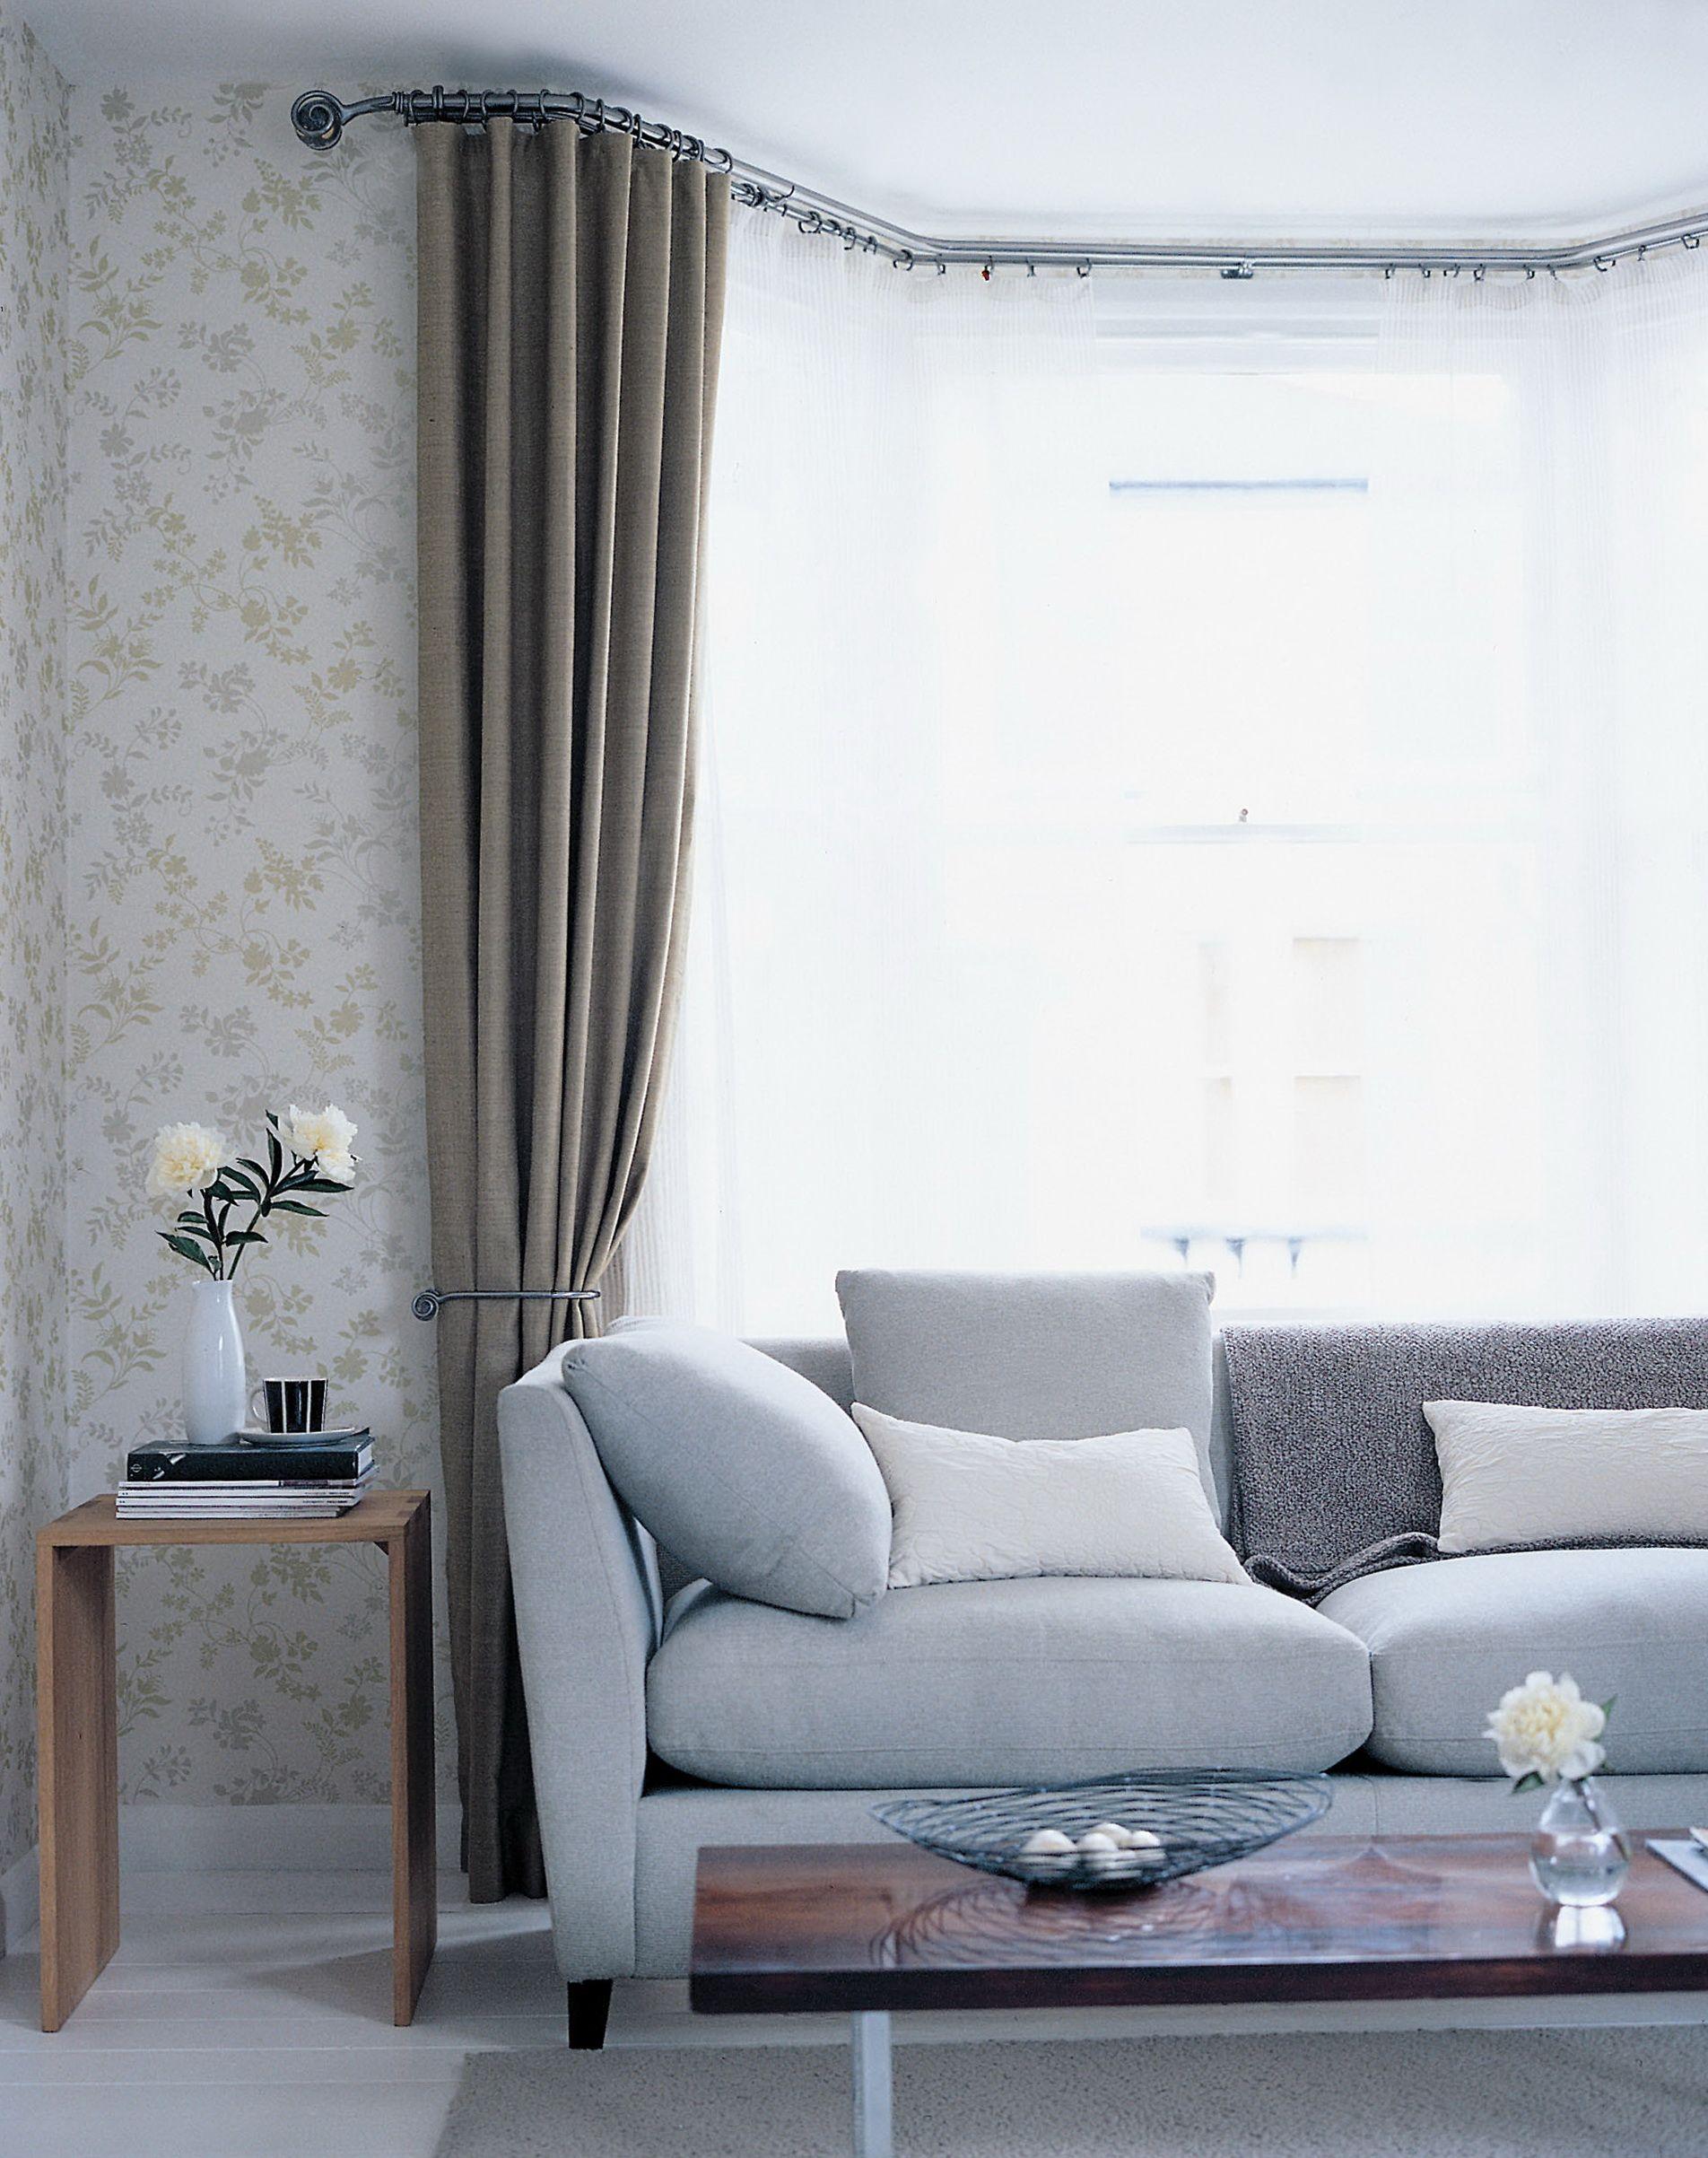 Curtain Ideas For Square Bay Window   Curtain Menzilperde.Net